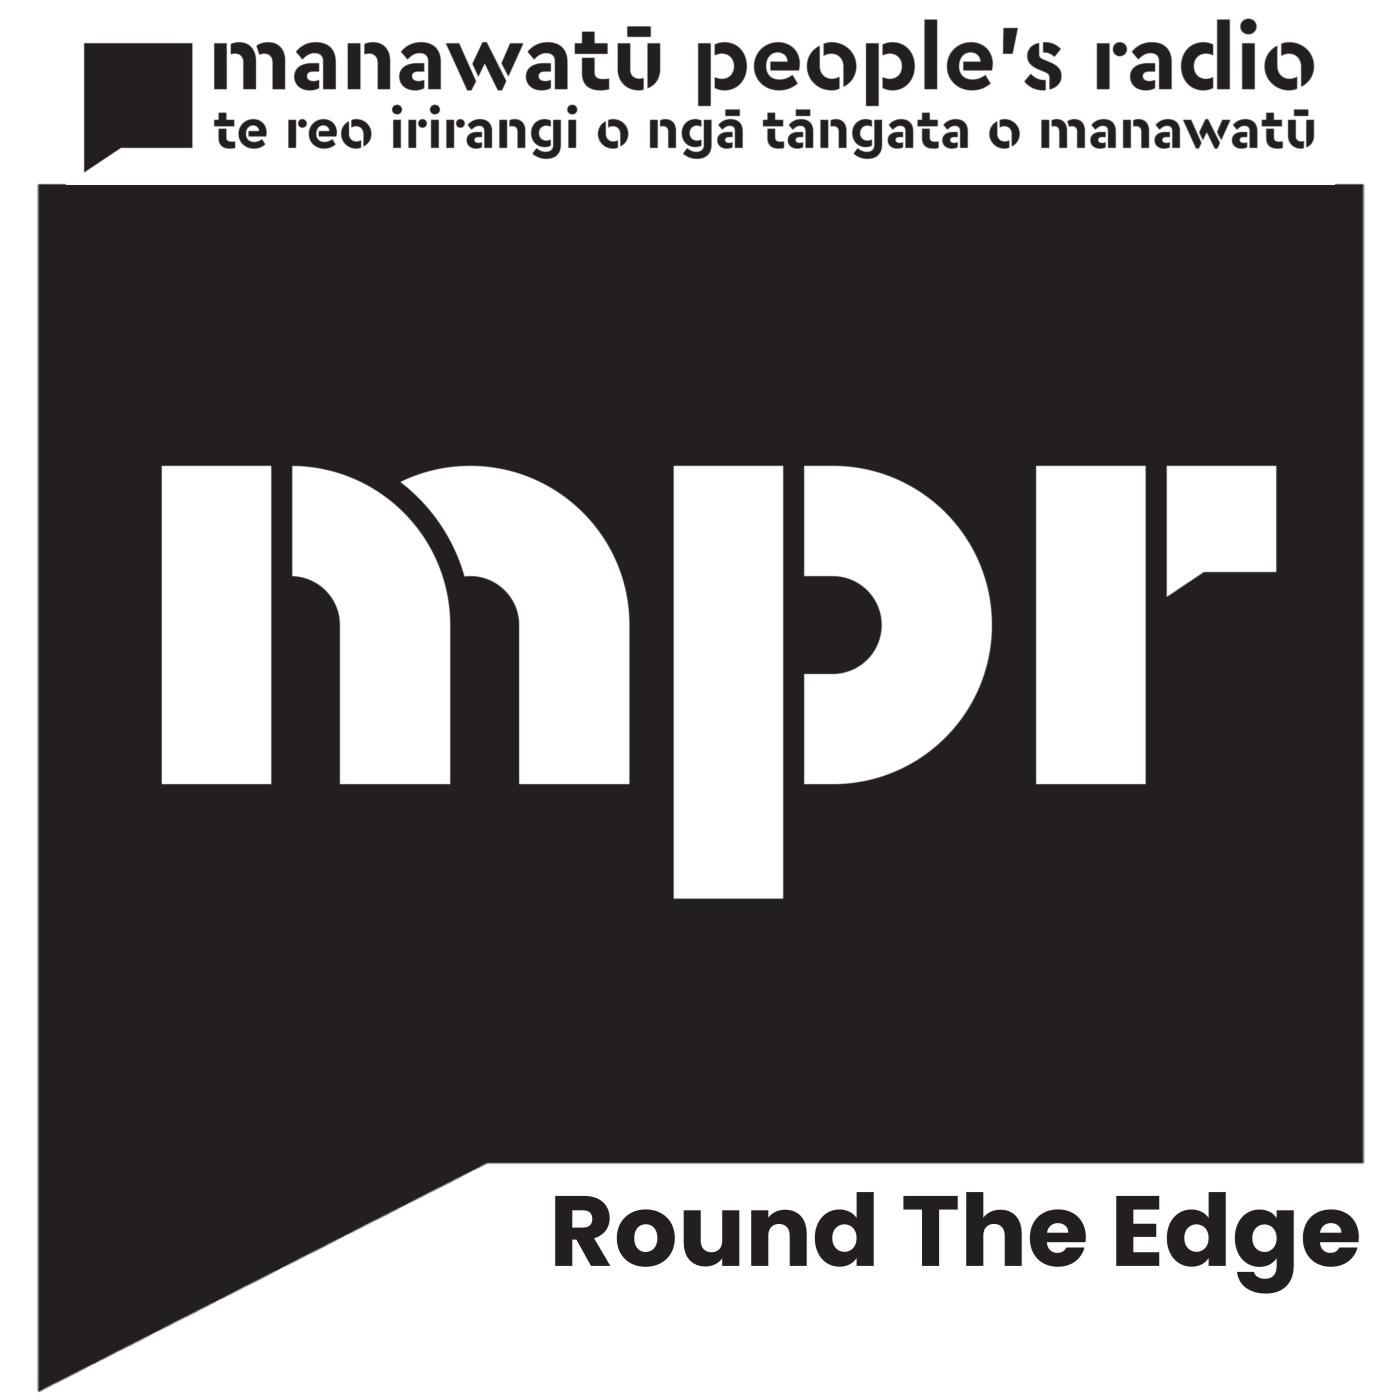 https://static.accessradio.org/StationFolder/manawatu/Images/MPR - RoundTheEdge.png